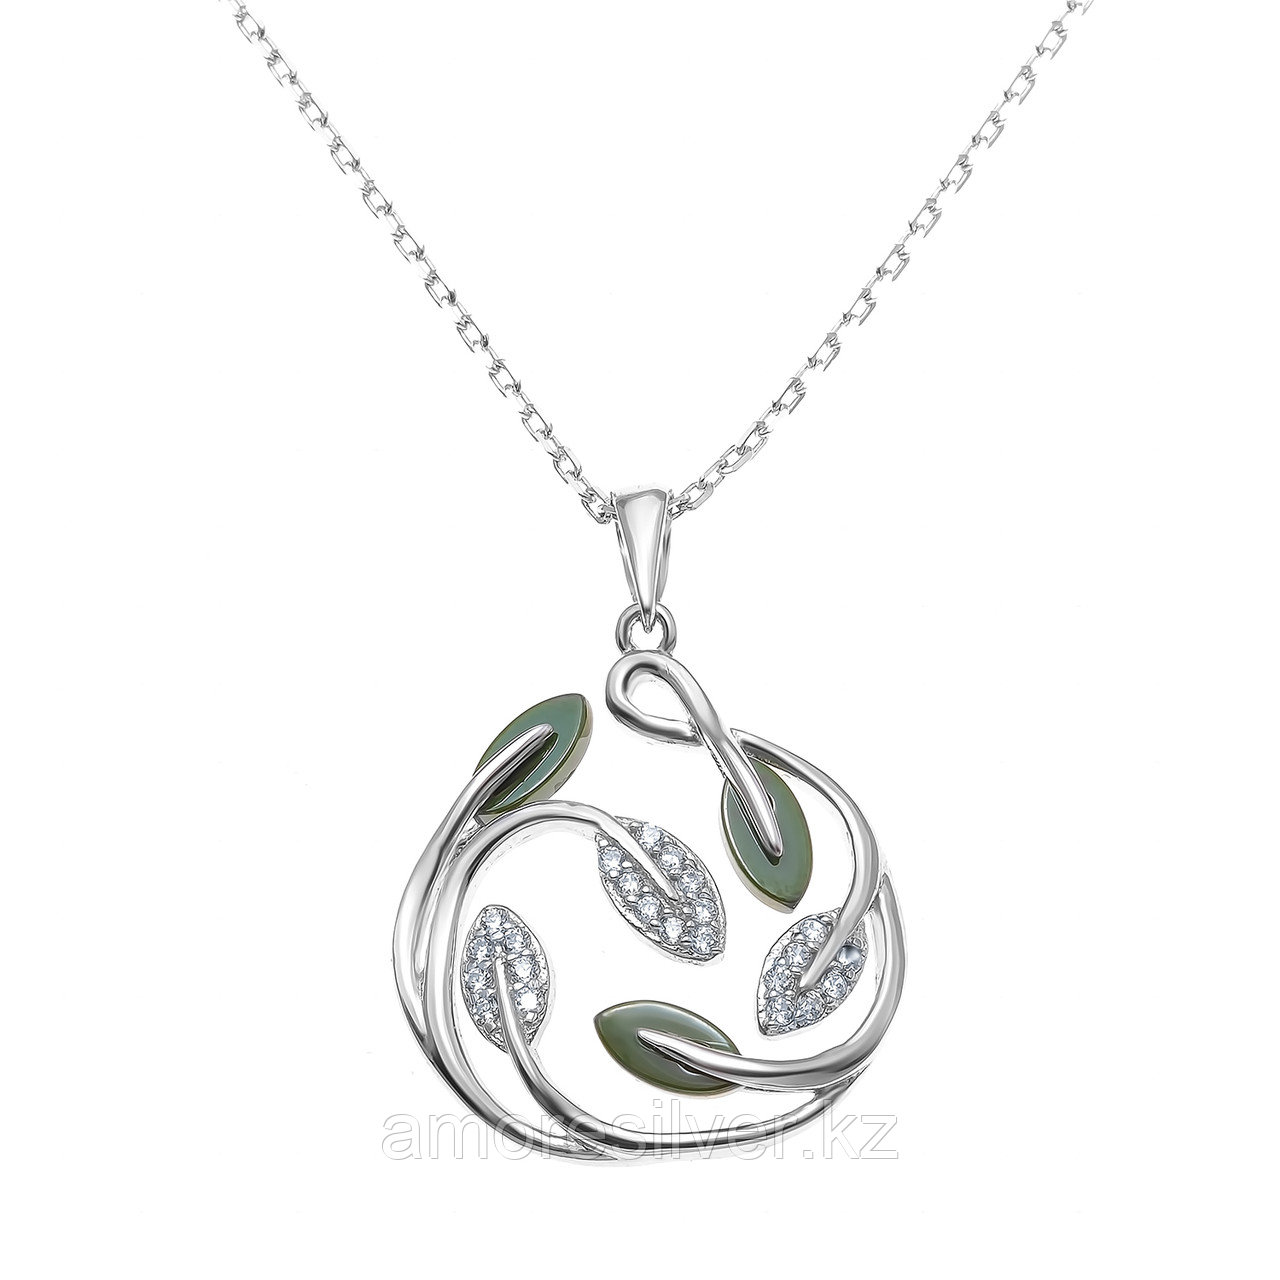 Колье Teosa серебро с родием, керамика фианит, флора ZCN-2252-O